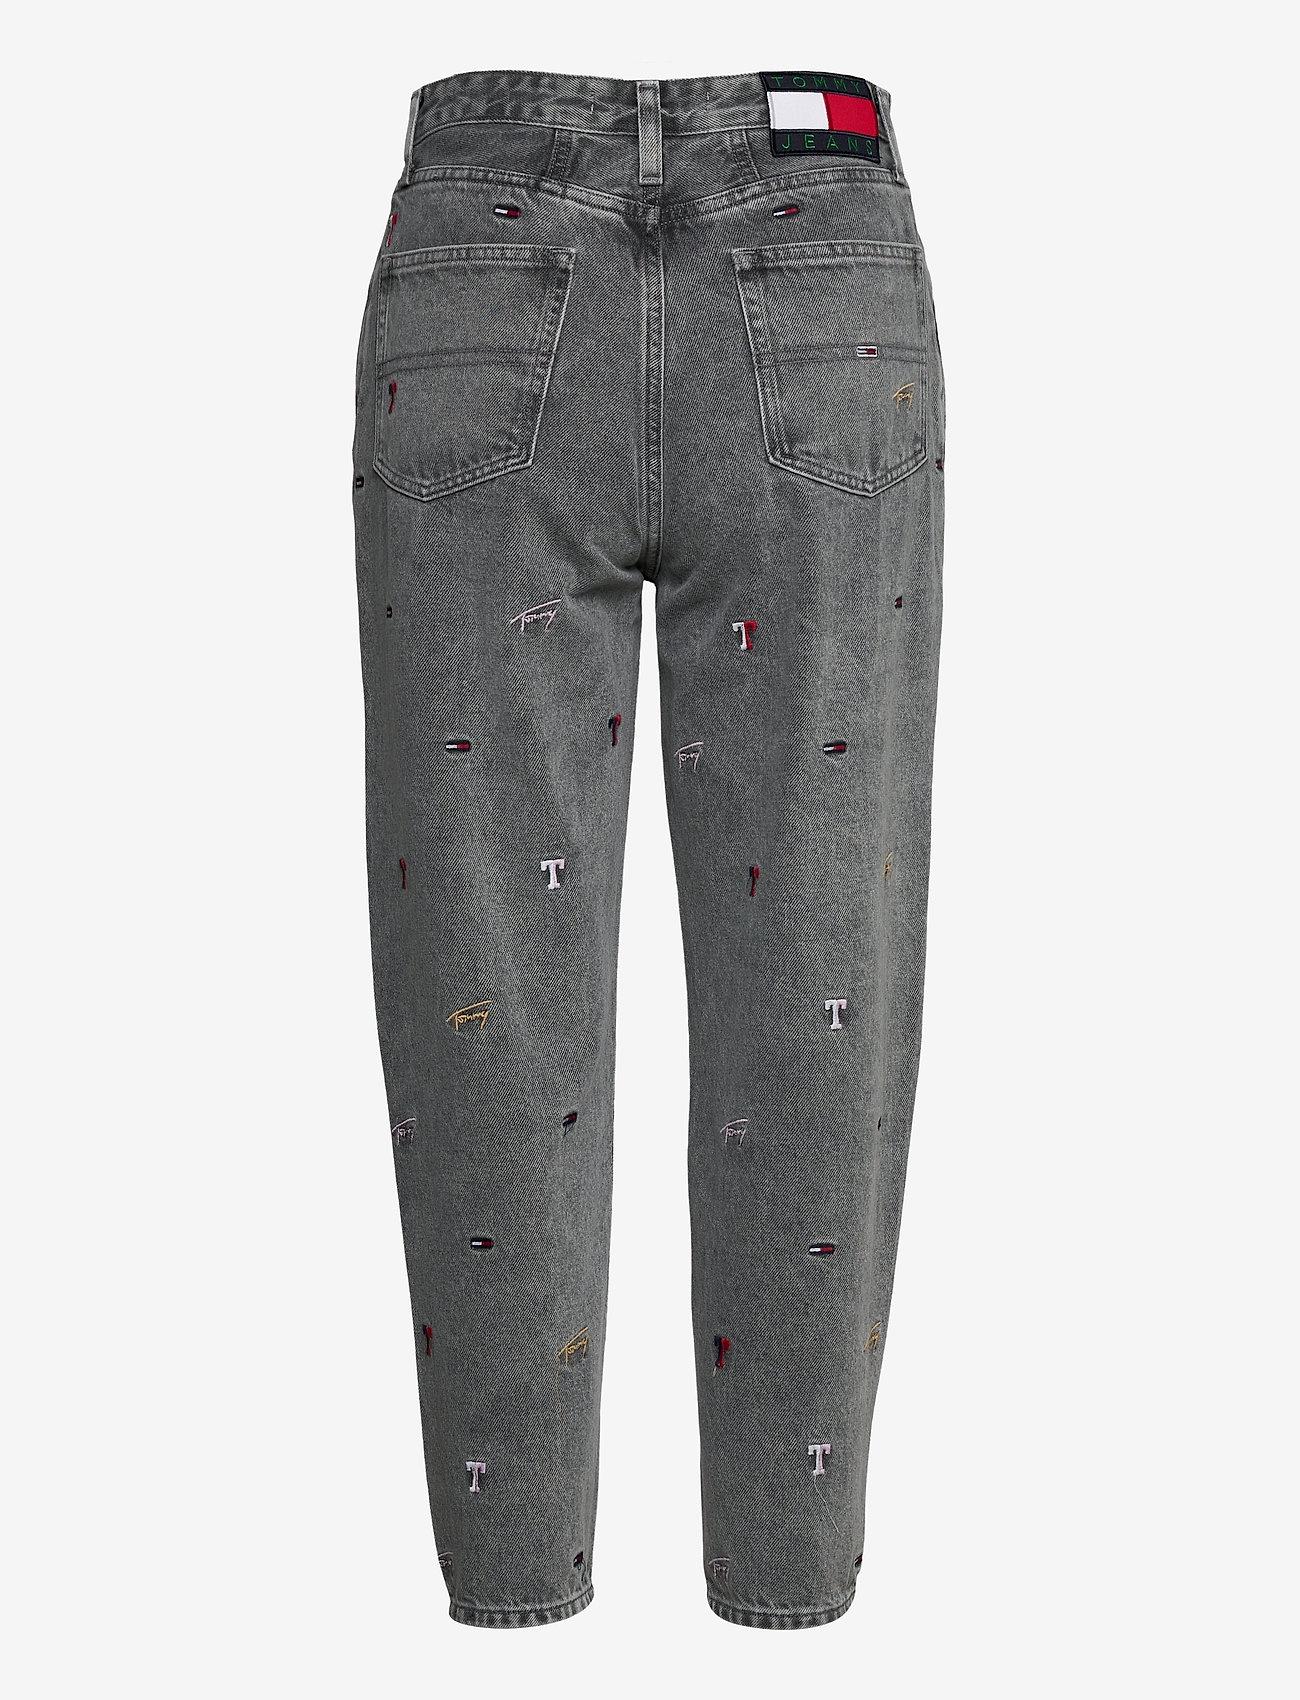 Tommy Jeans - MOM JEAN HR TPRD SSPGR - mom jeans - save sp critter grey rig - 1